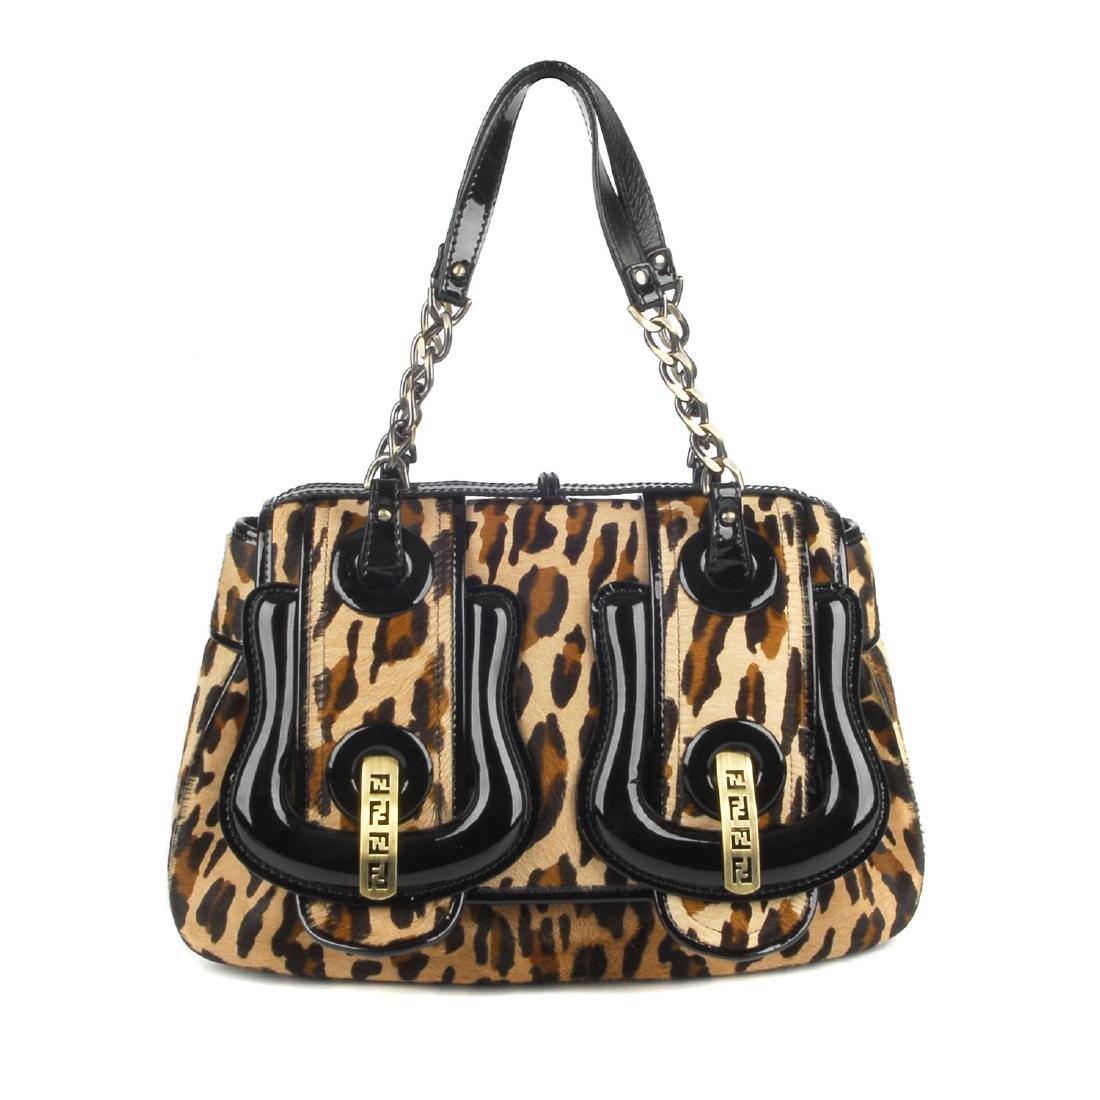 FENDI - a Double Buckle Flap handbag. Featuring a